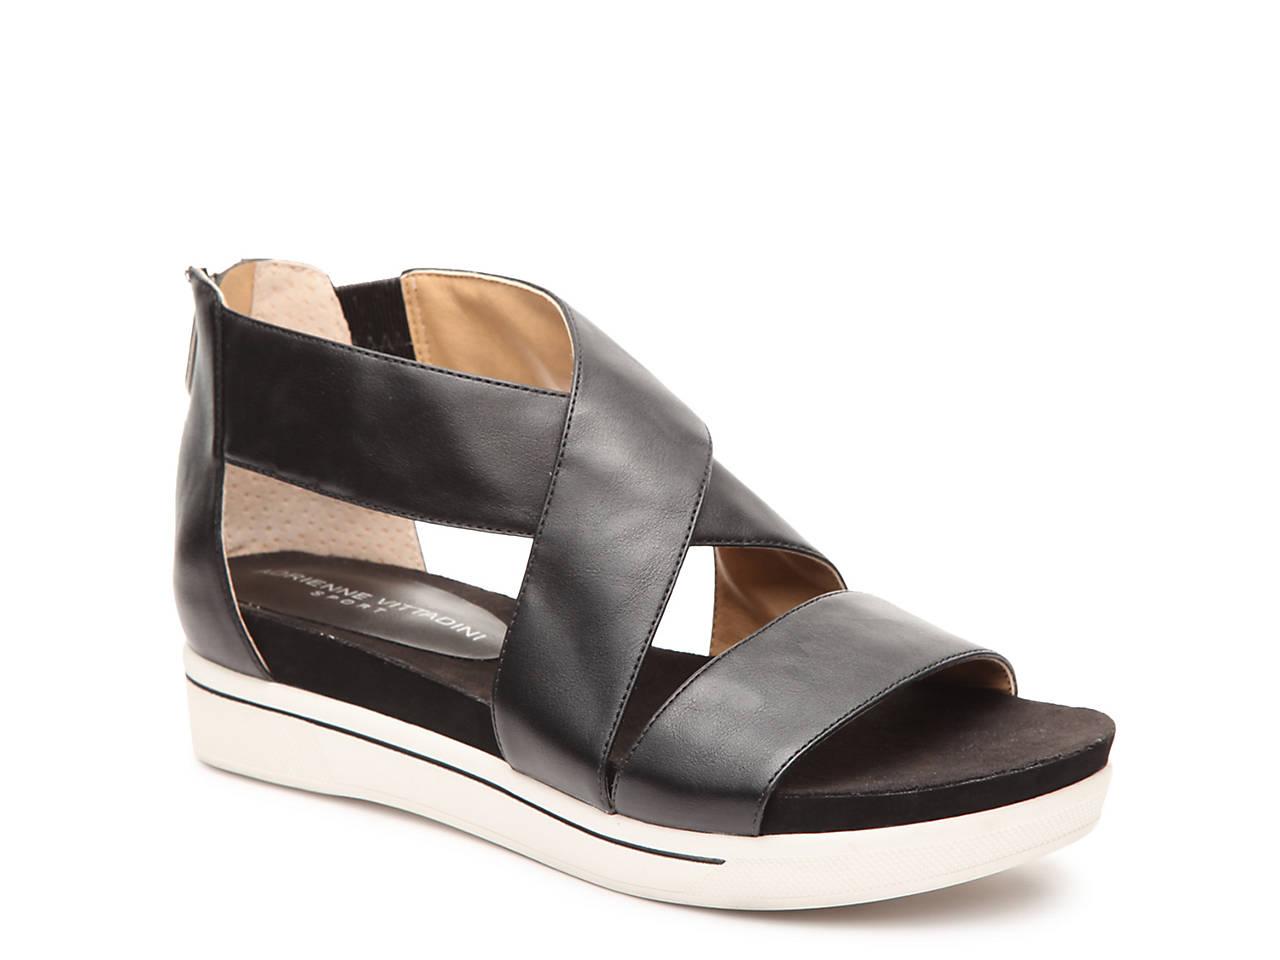 508bc2697d1 Adrienne Vittadini Claud Gladiator Sandal Women s Shoes